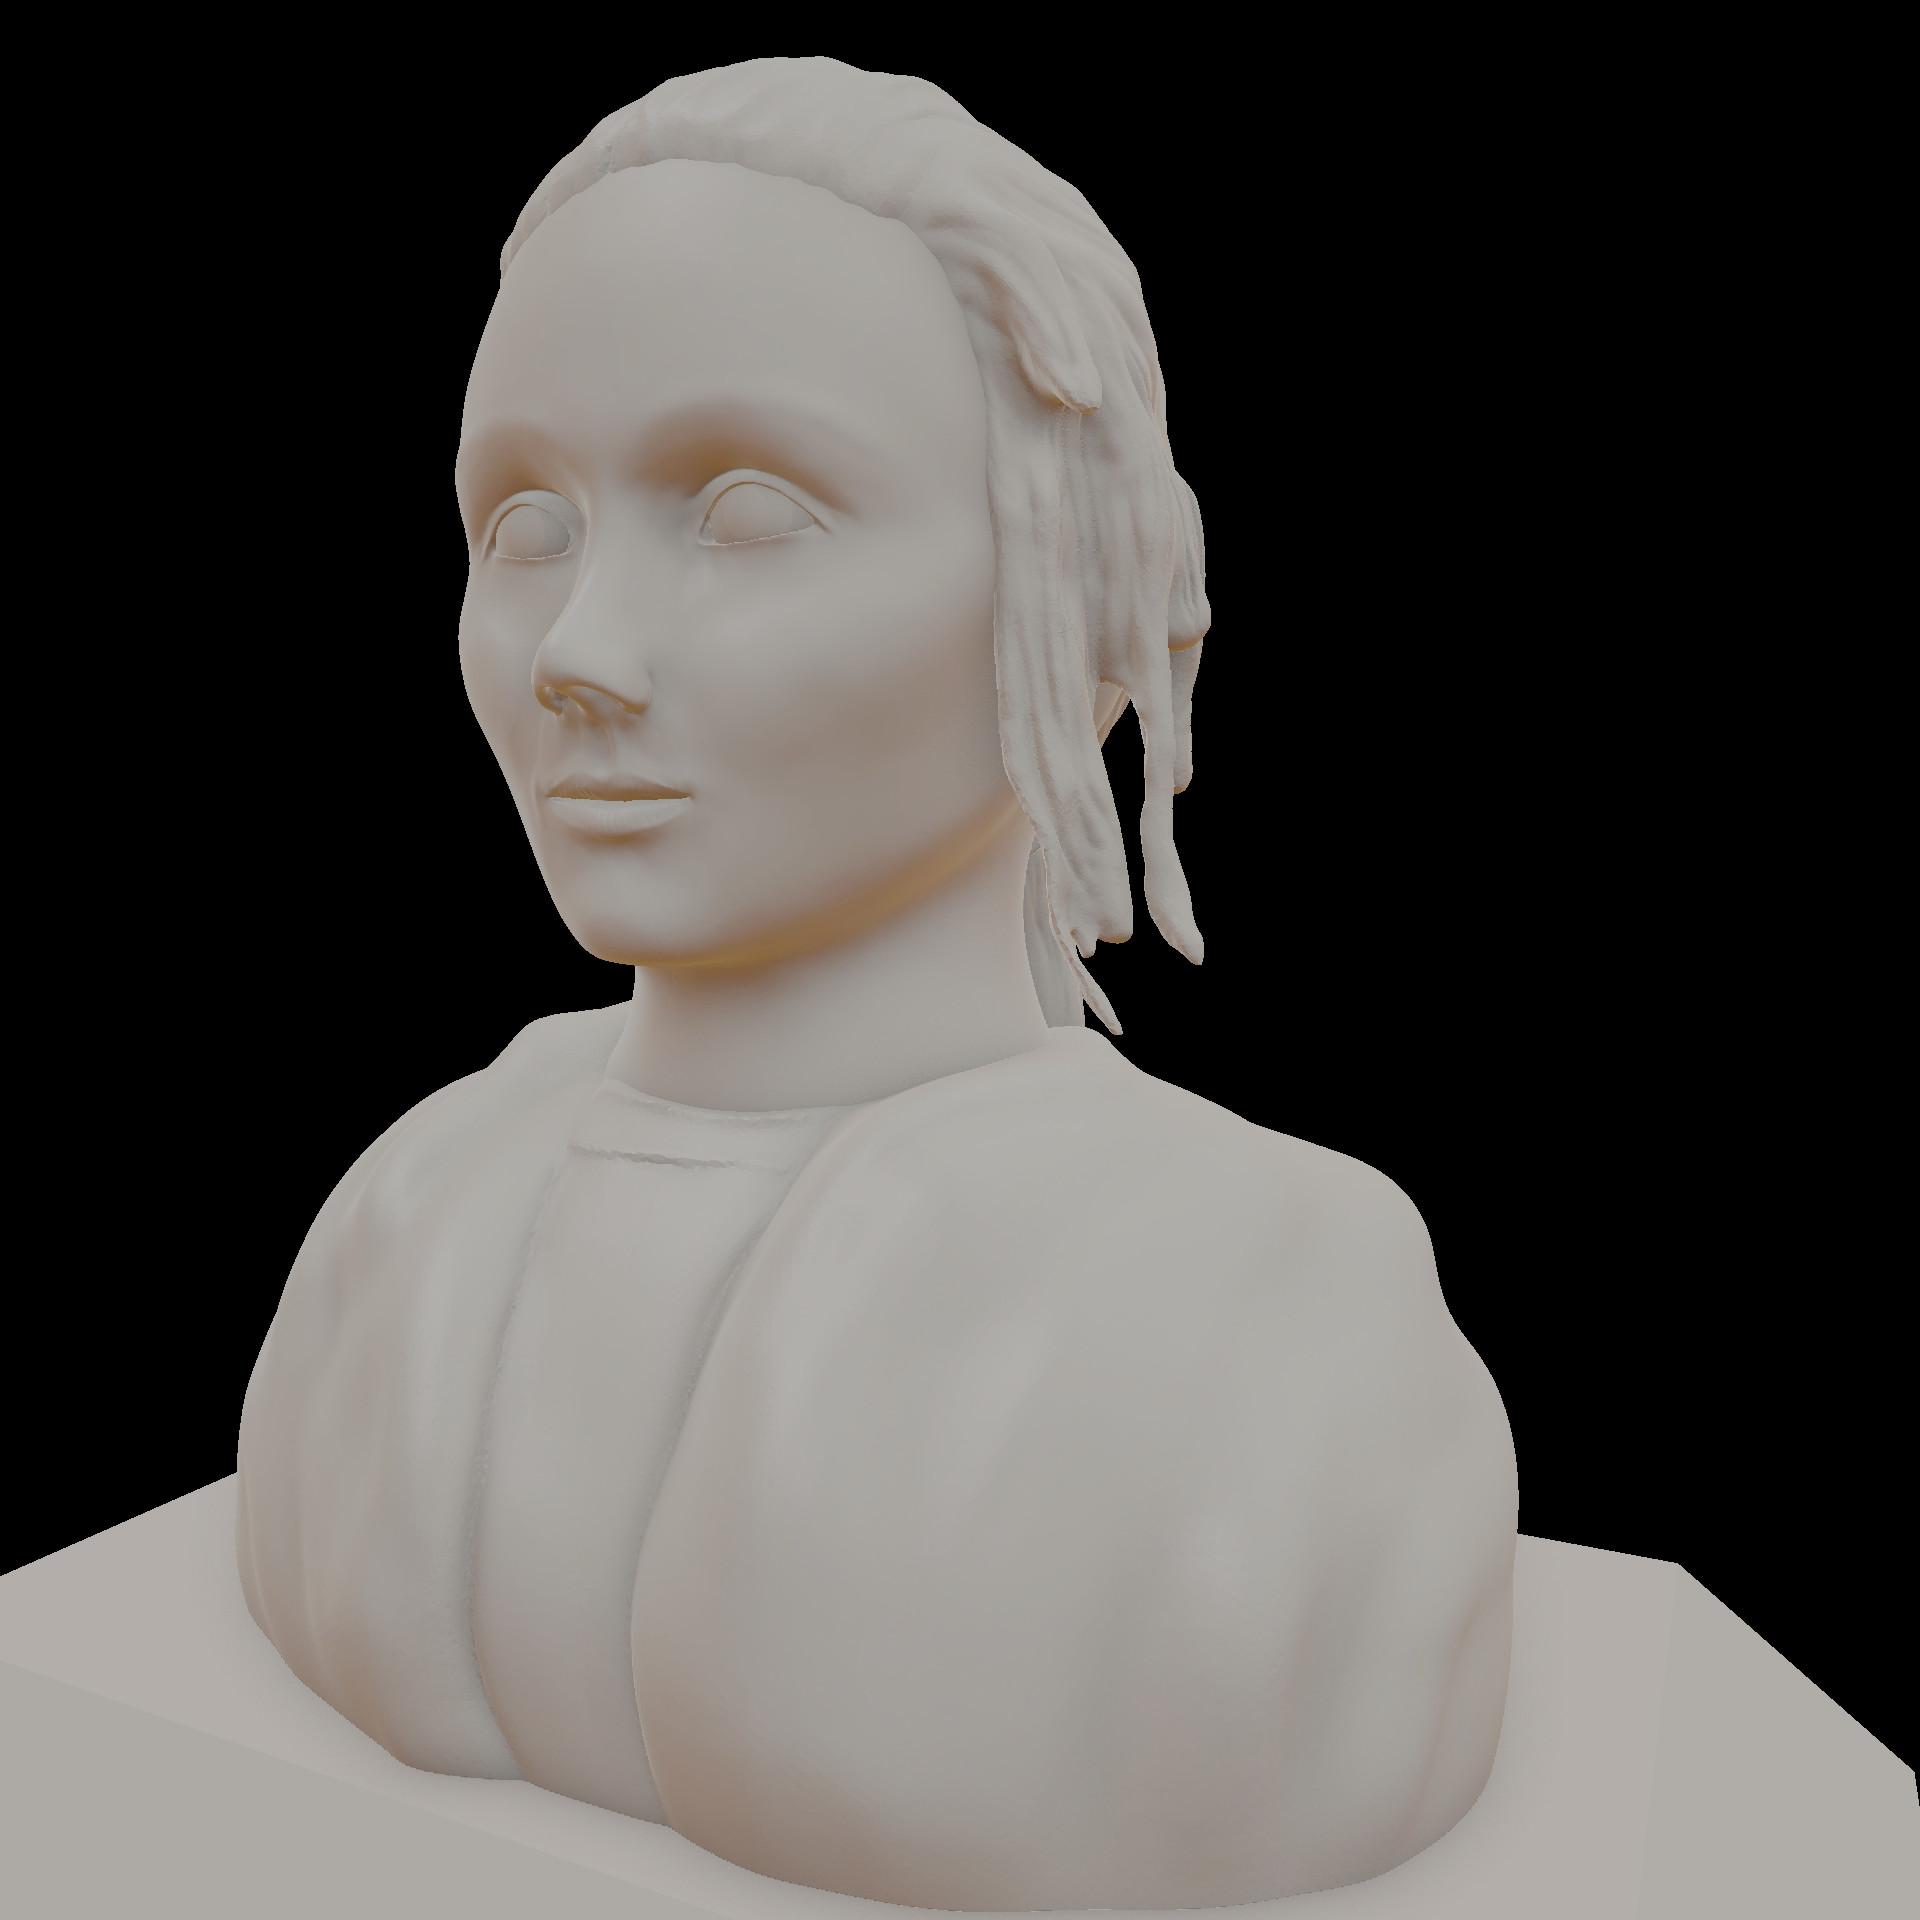 Johna aae sculpthead1 0